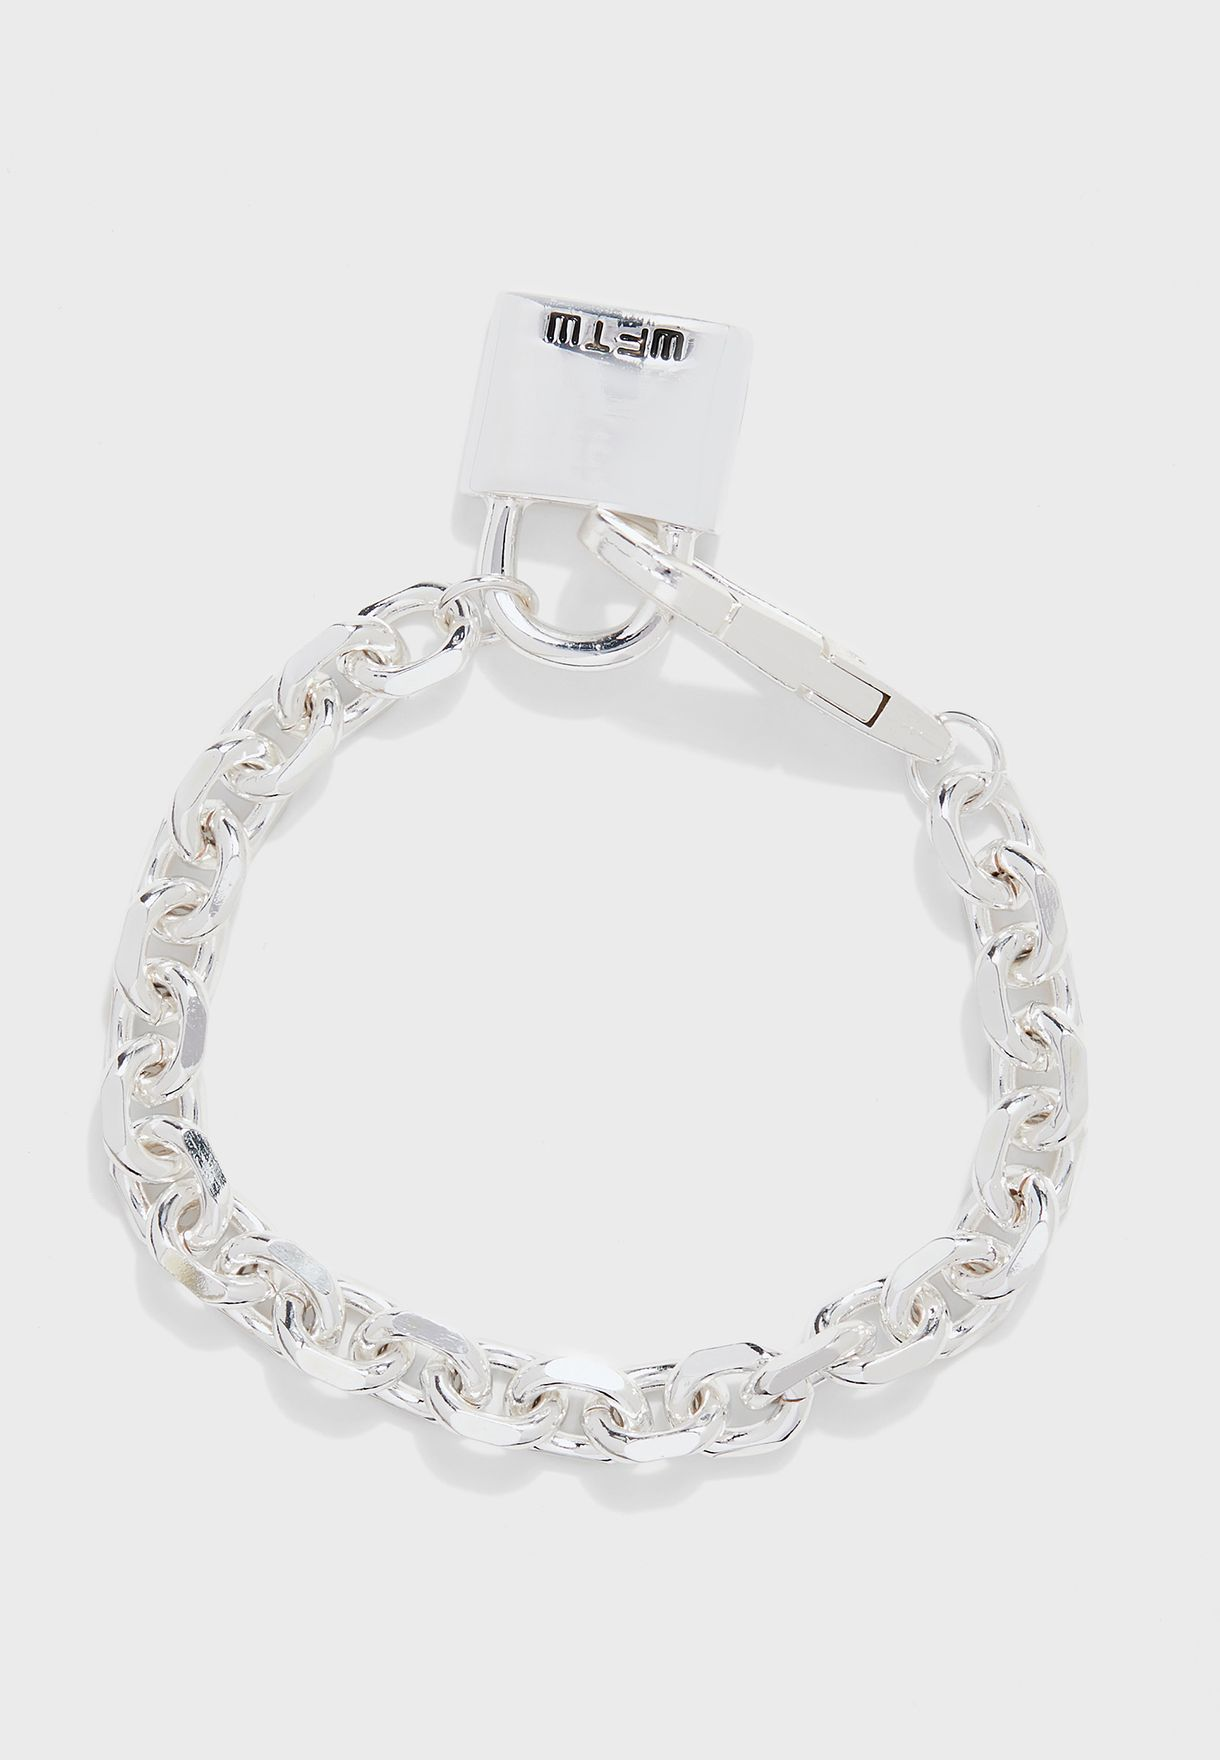 Lockdown Link Chain Bracelet